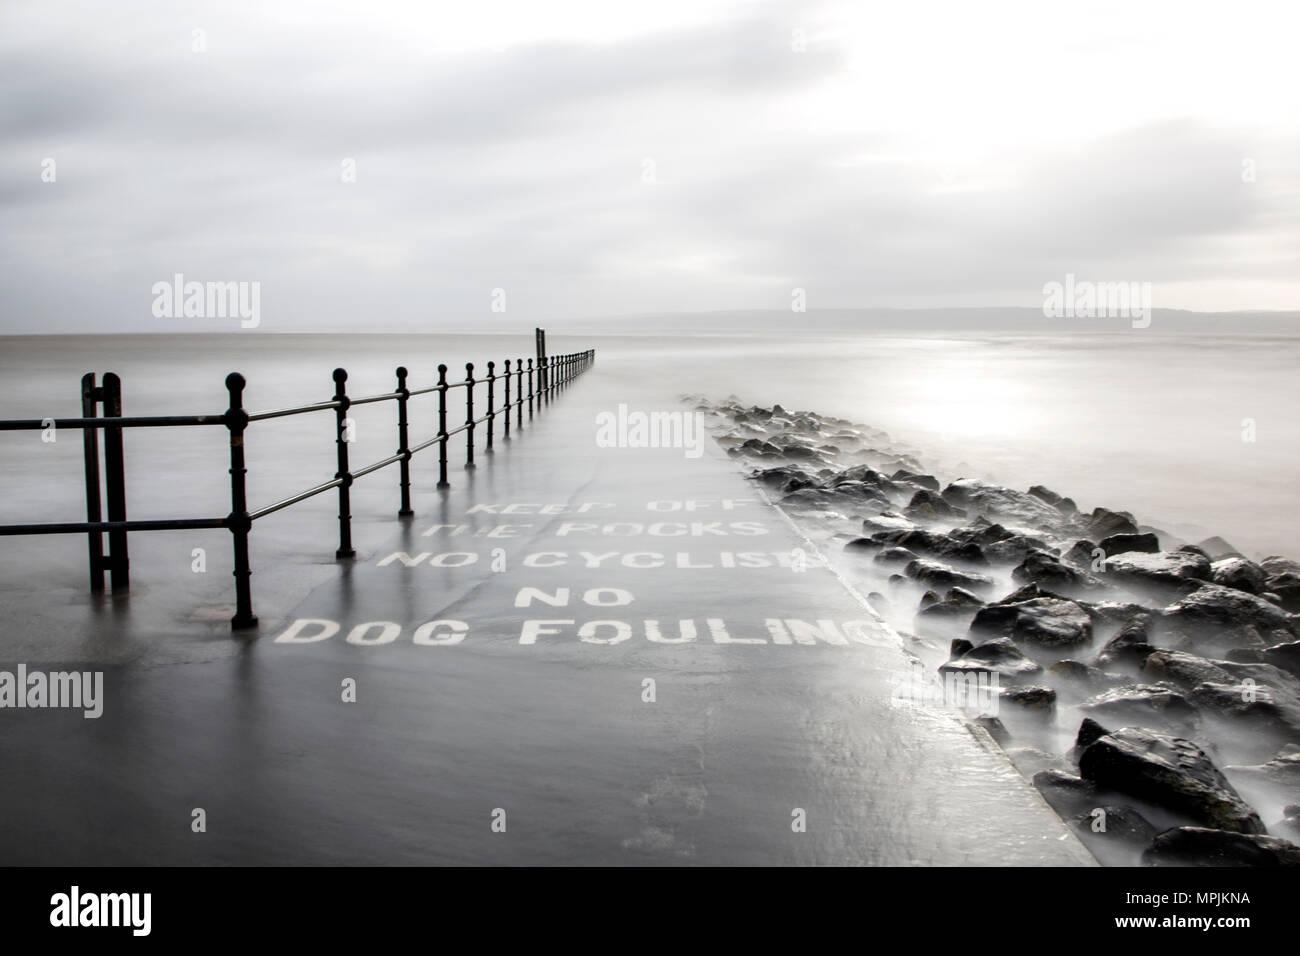 Marine lake pathway into the stormy sea. - Stock Image